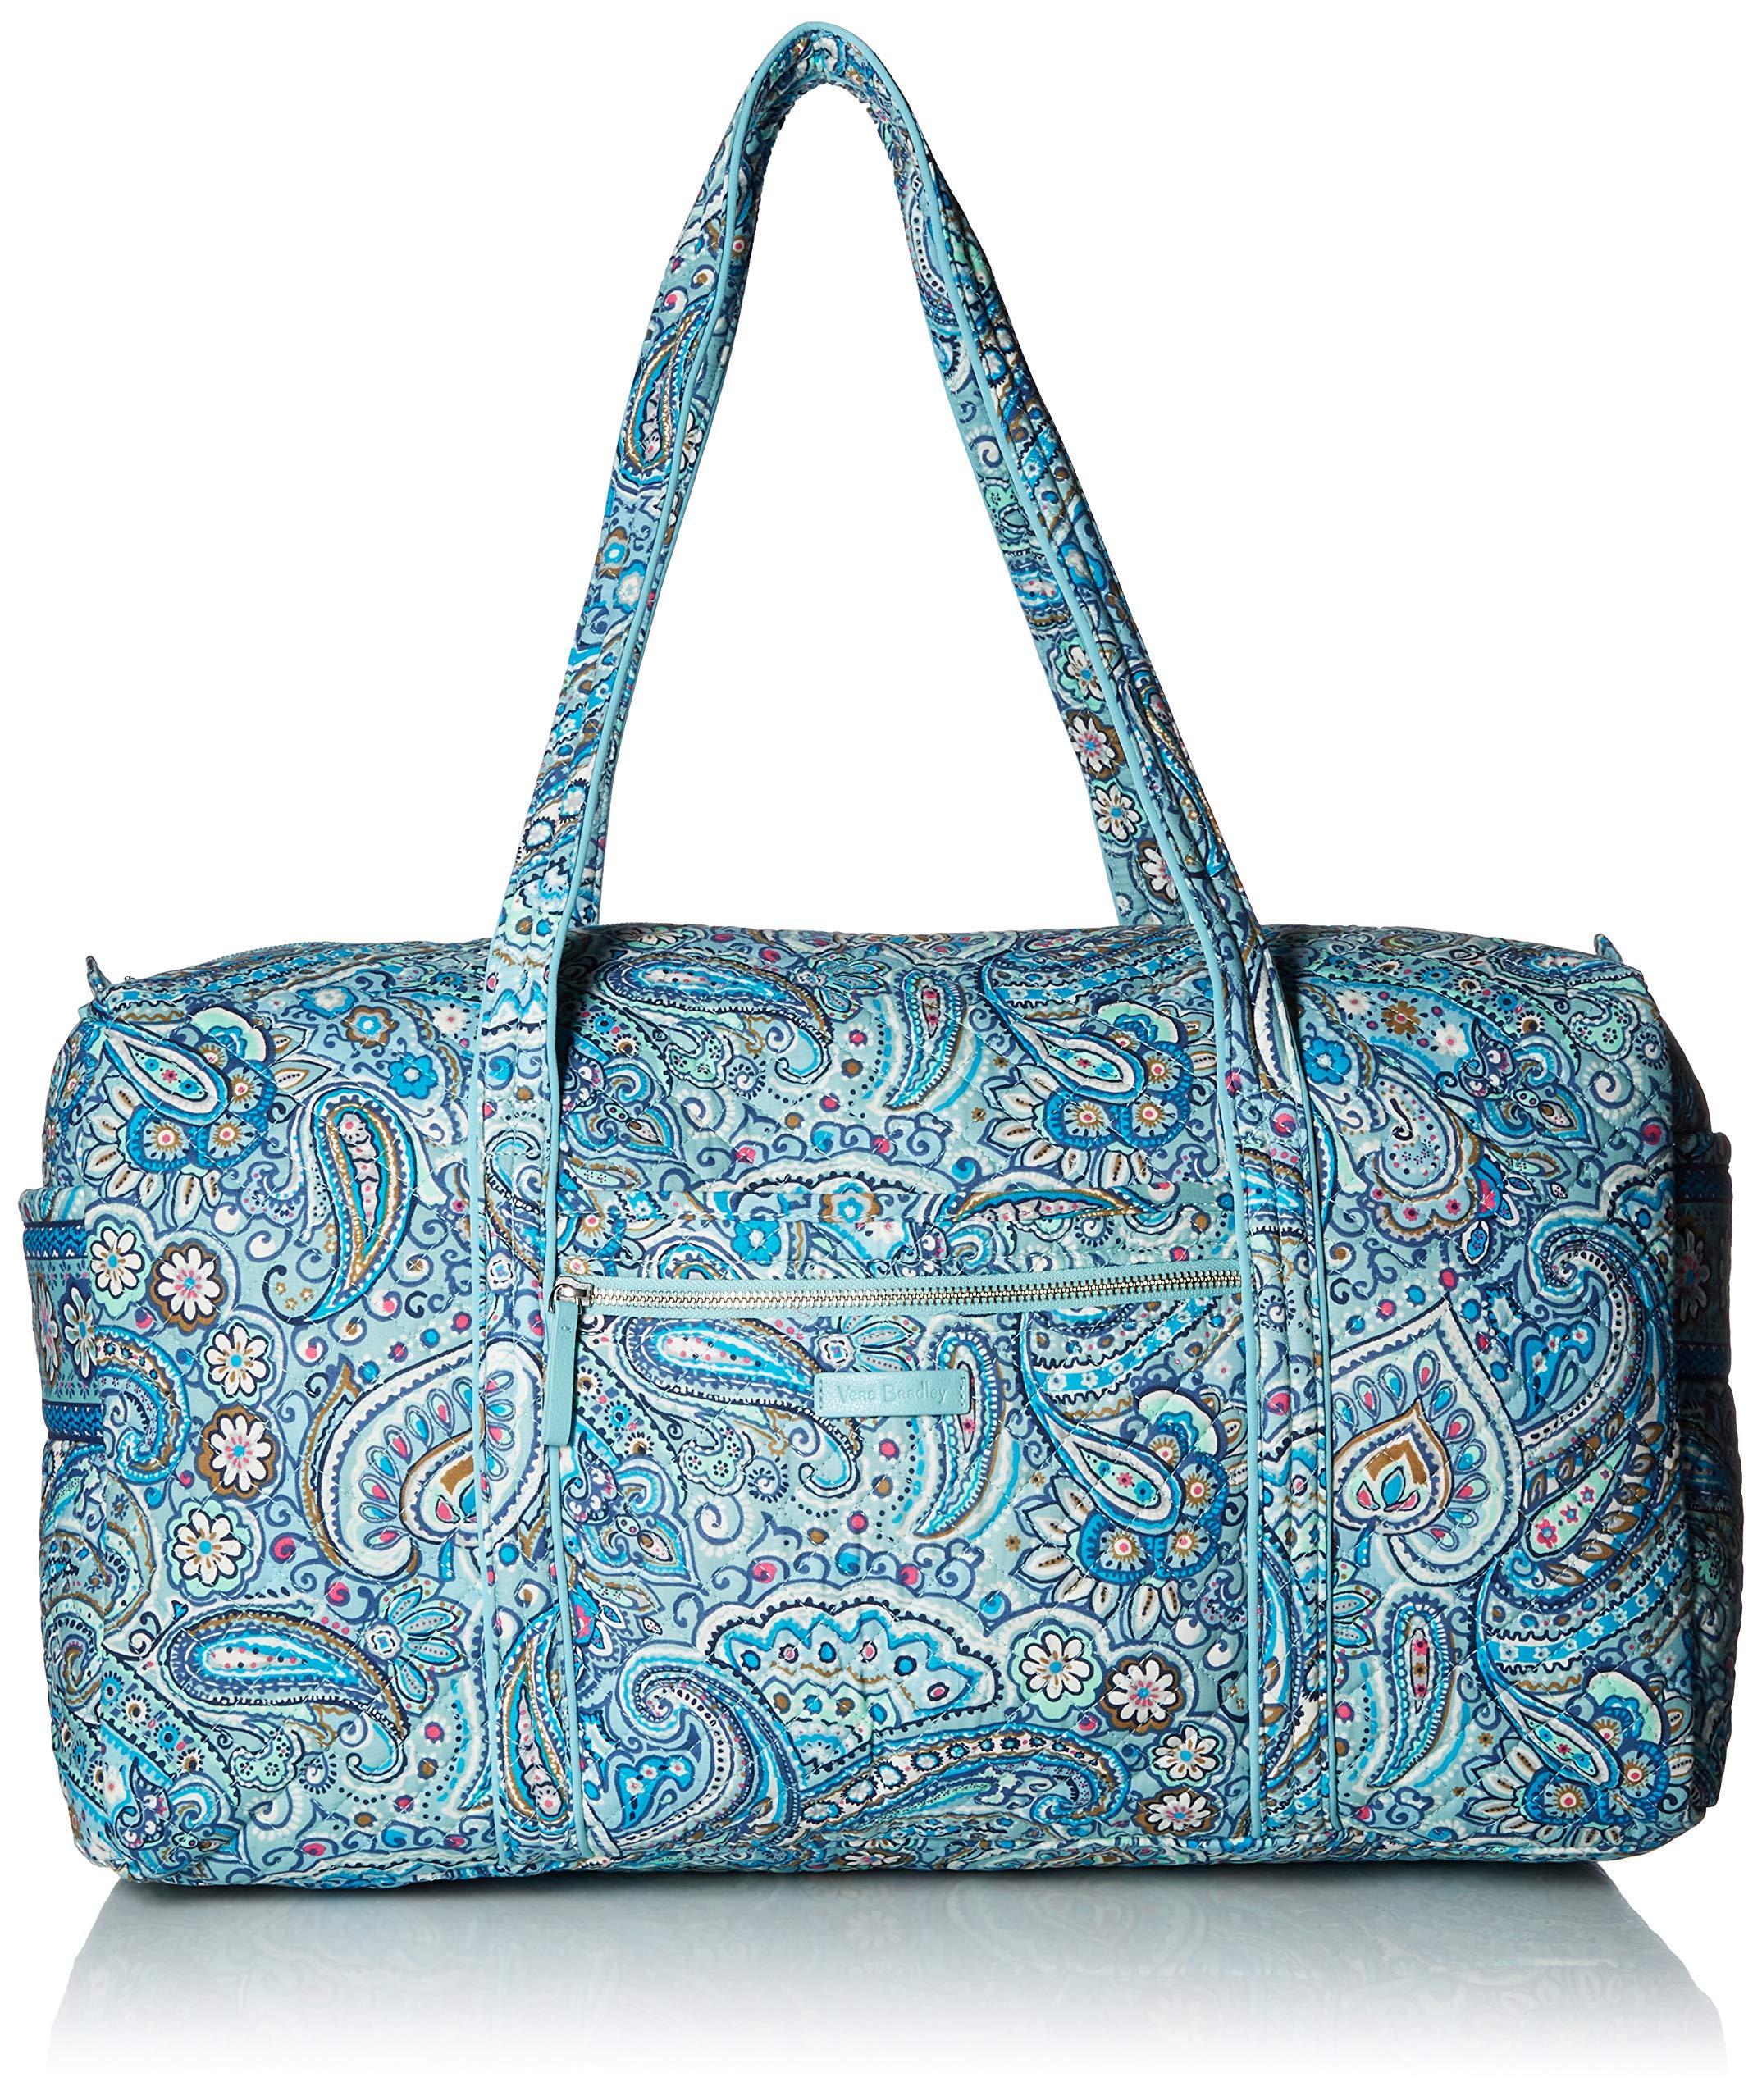 Vera Bradley Womens Iconic Large Travel Duffel, Signature Cotton, Daisy Dot Paisley